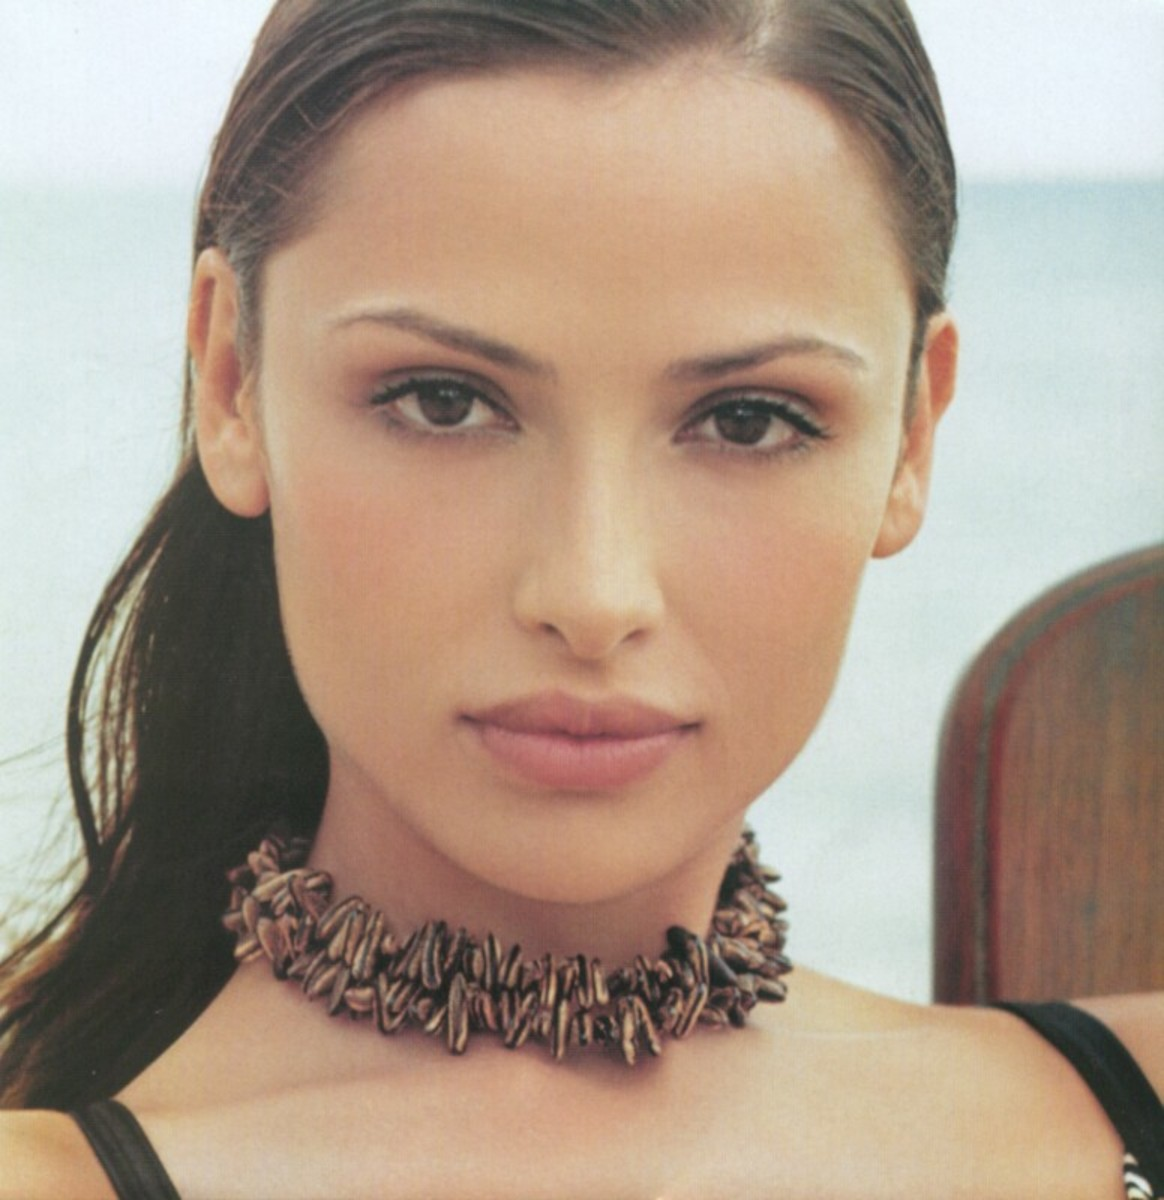 almudena-fernandez-spains-hottest-supermodel